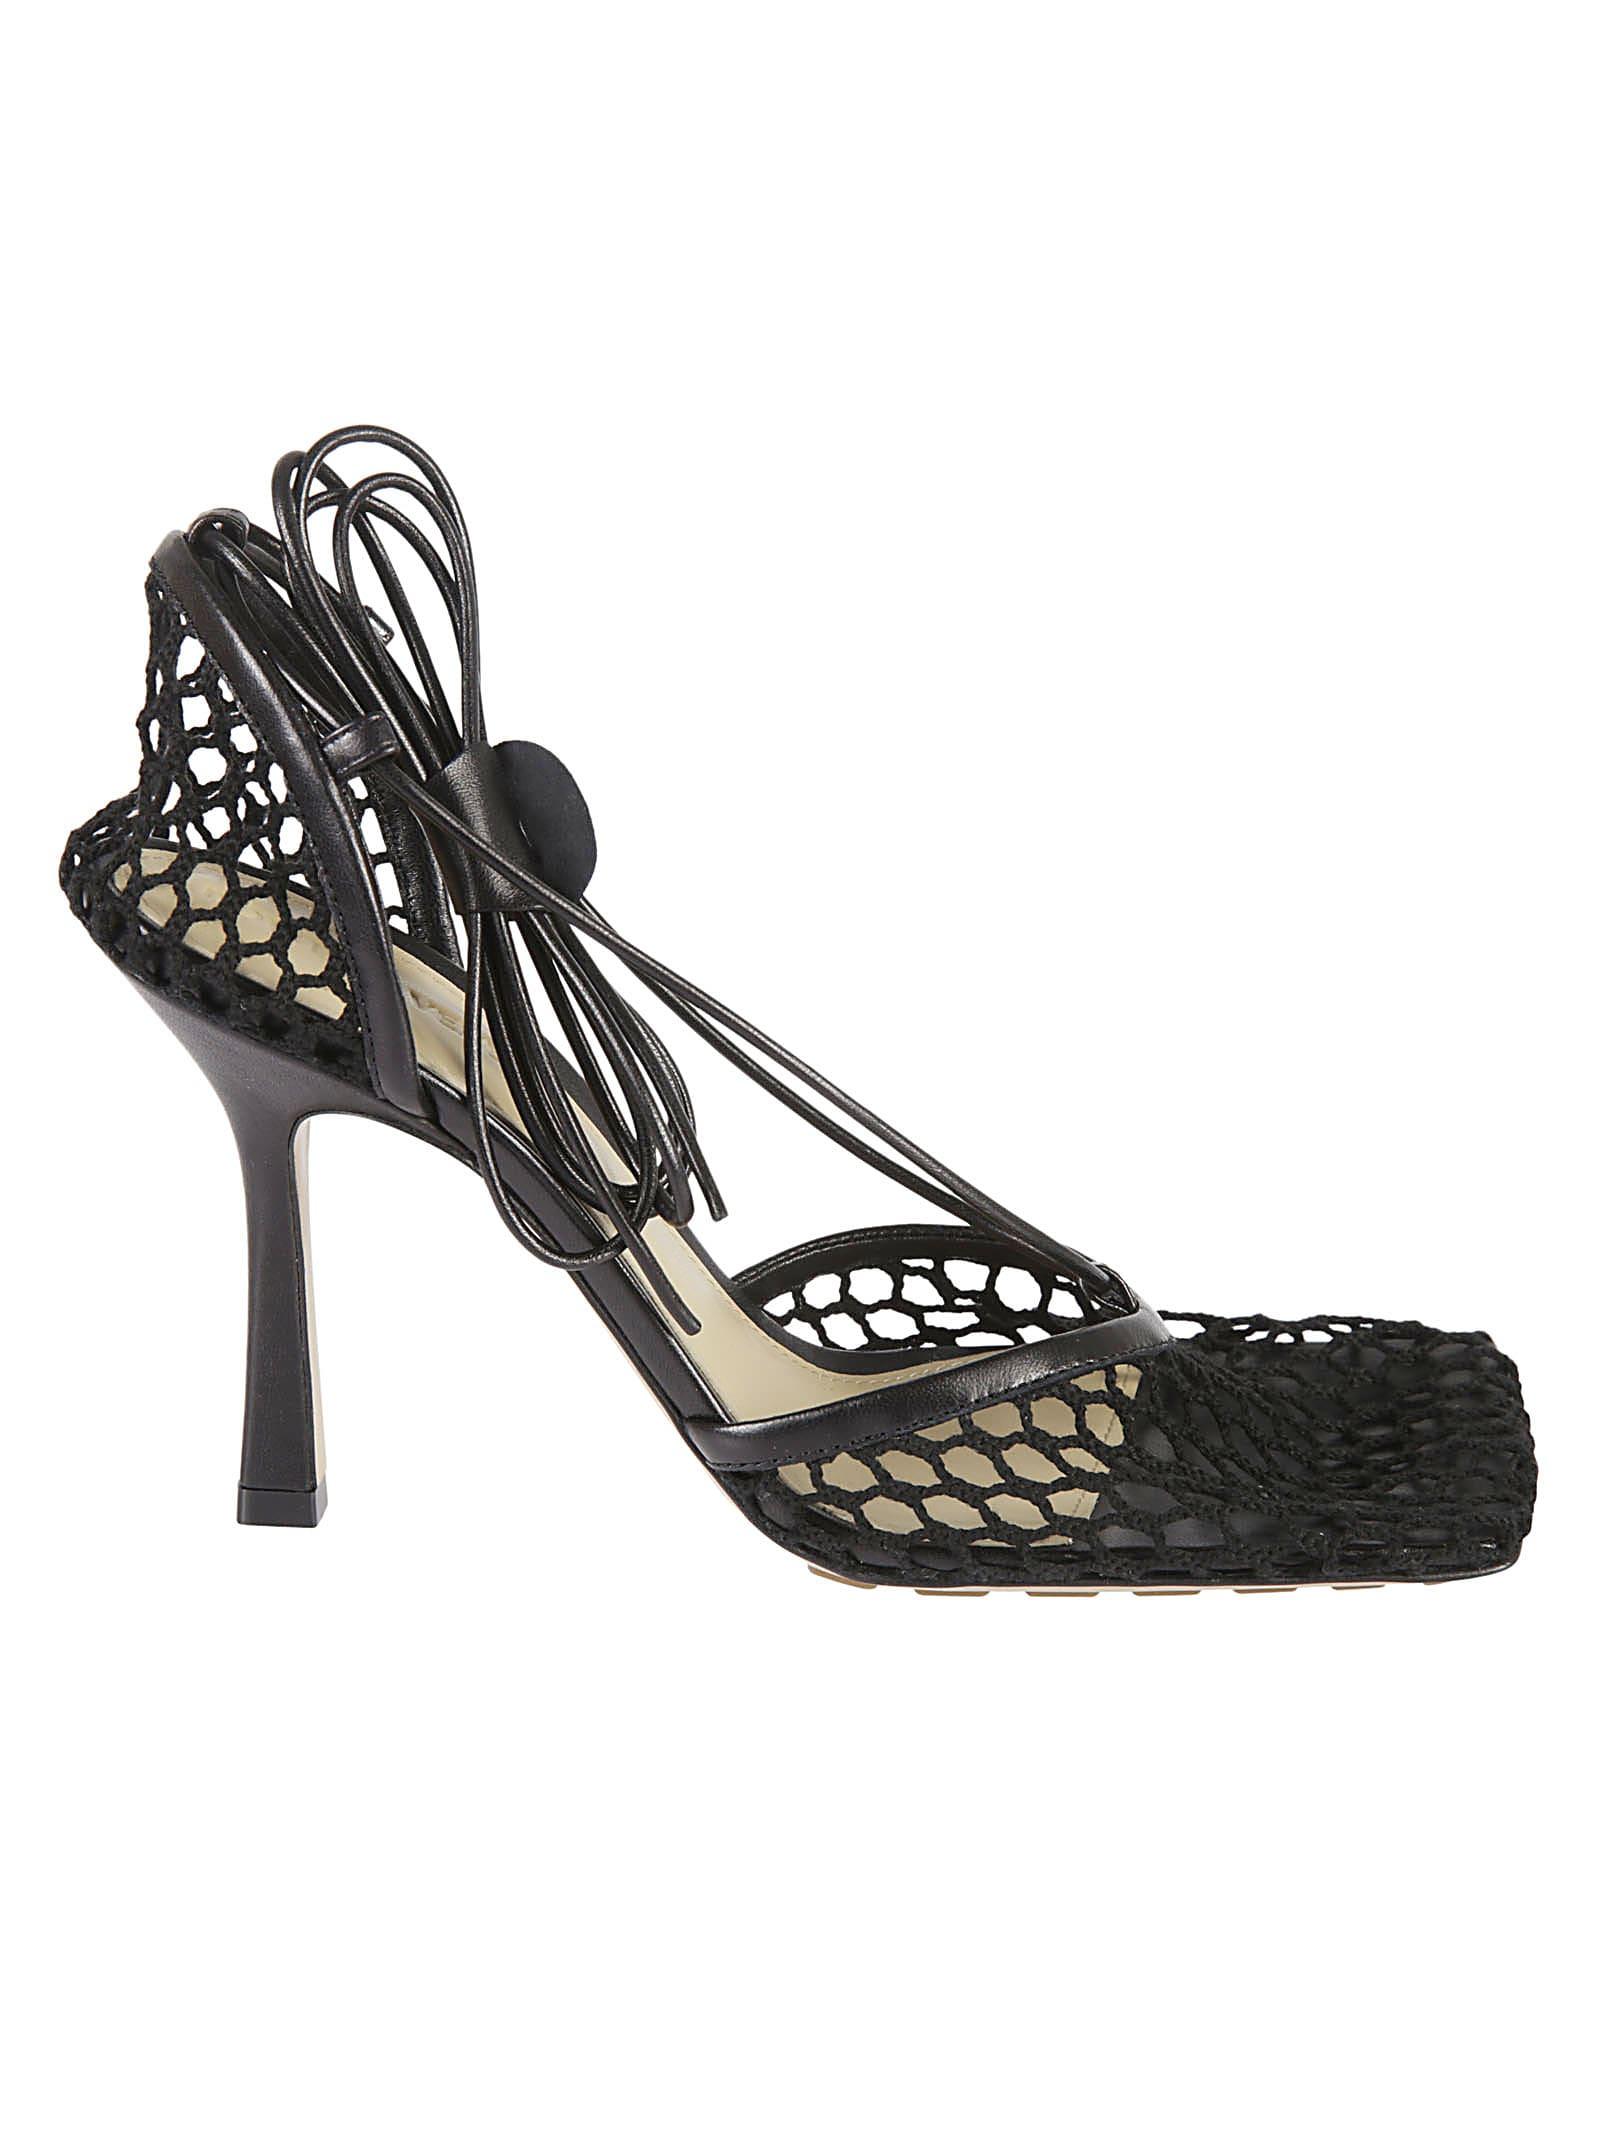 Bottega Veneta Sandals STRETCH WEB SANDALS